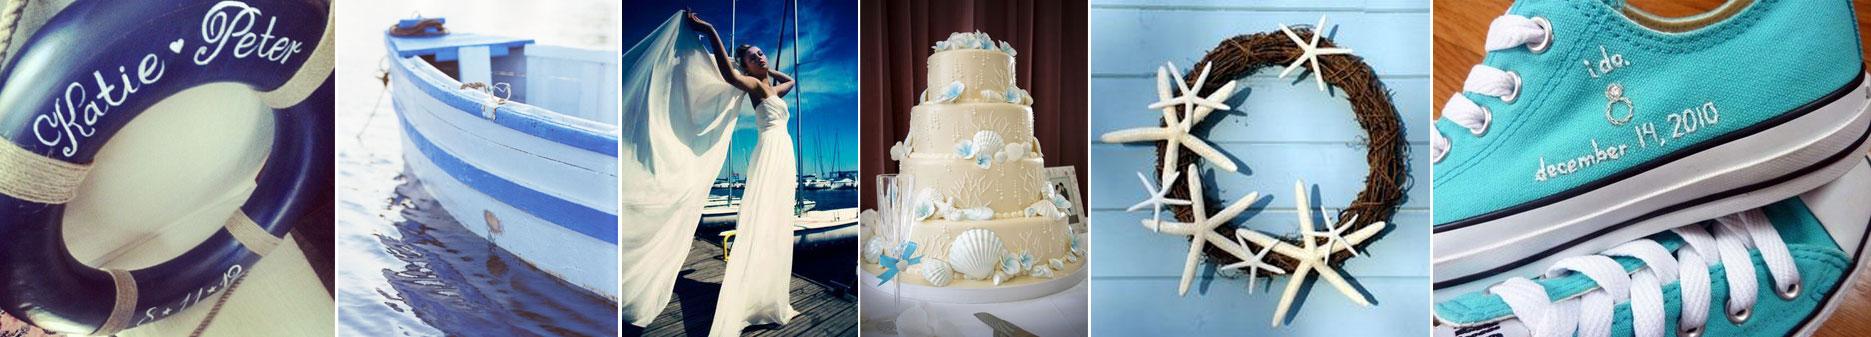 poradnik ślubny wedding planner'ki - kolor morski na ślub inspiracje